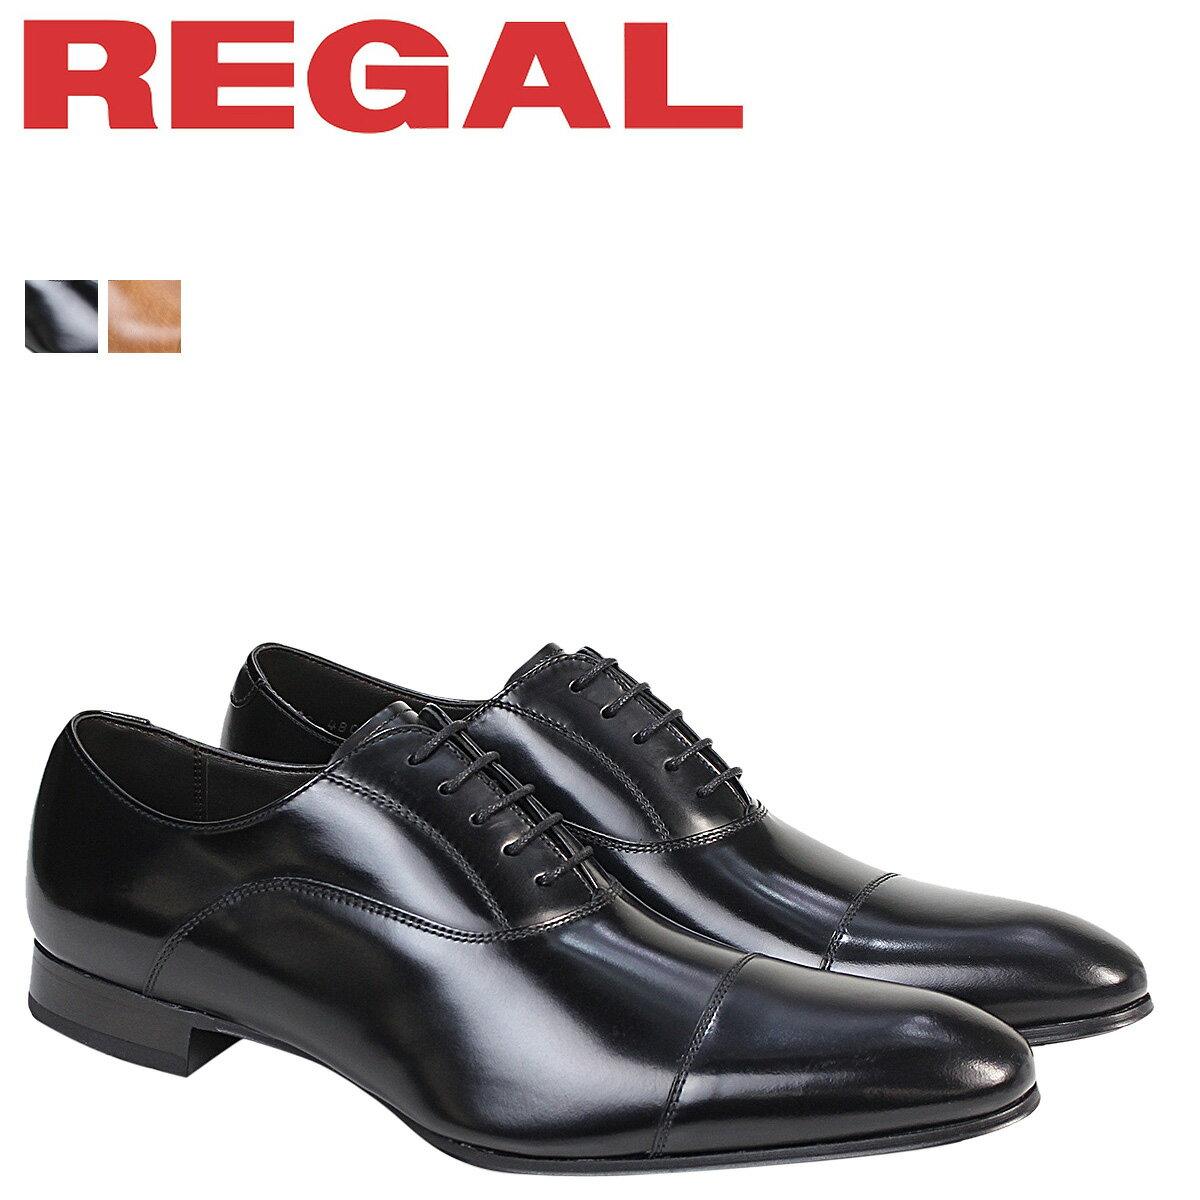 REGAL 靴 メンズ リーガル ストレートチップ 011RAL ビジネスシューズ 防水 [9/14 追加入荷] [179]